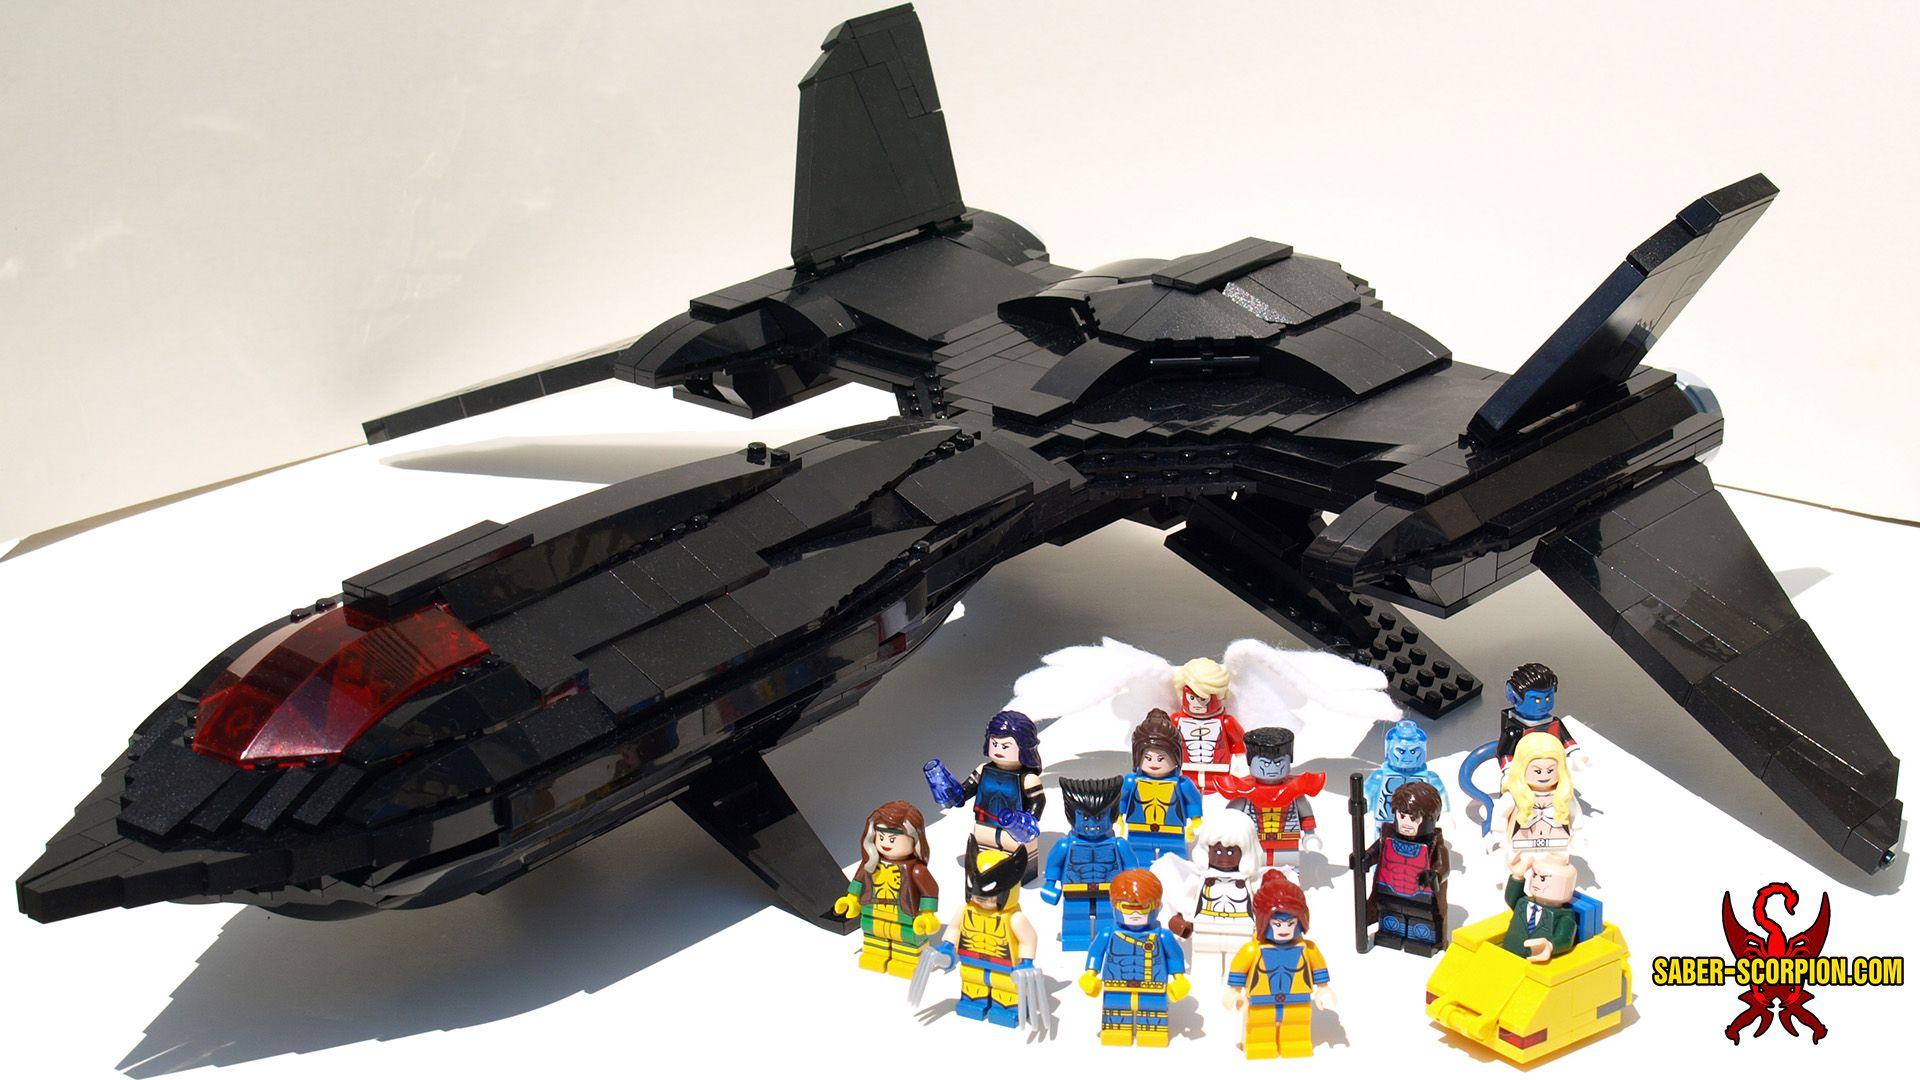 Cool Stuff: Lego X-Mansion From 'X-Men' - /Film